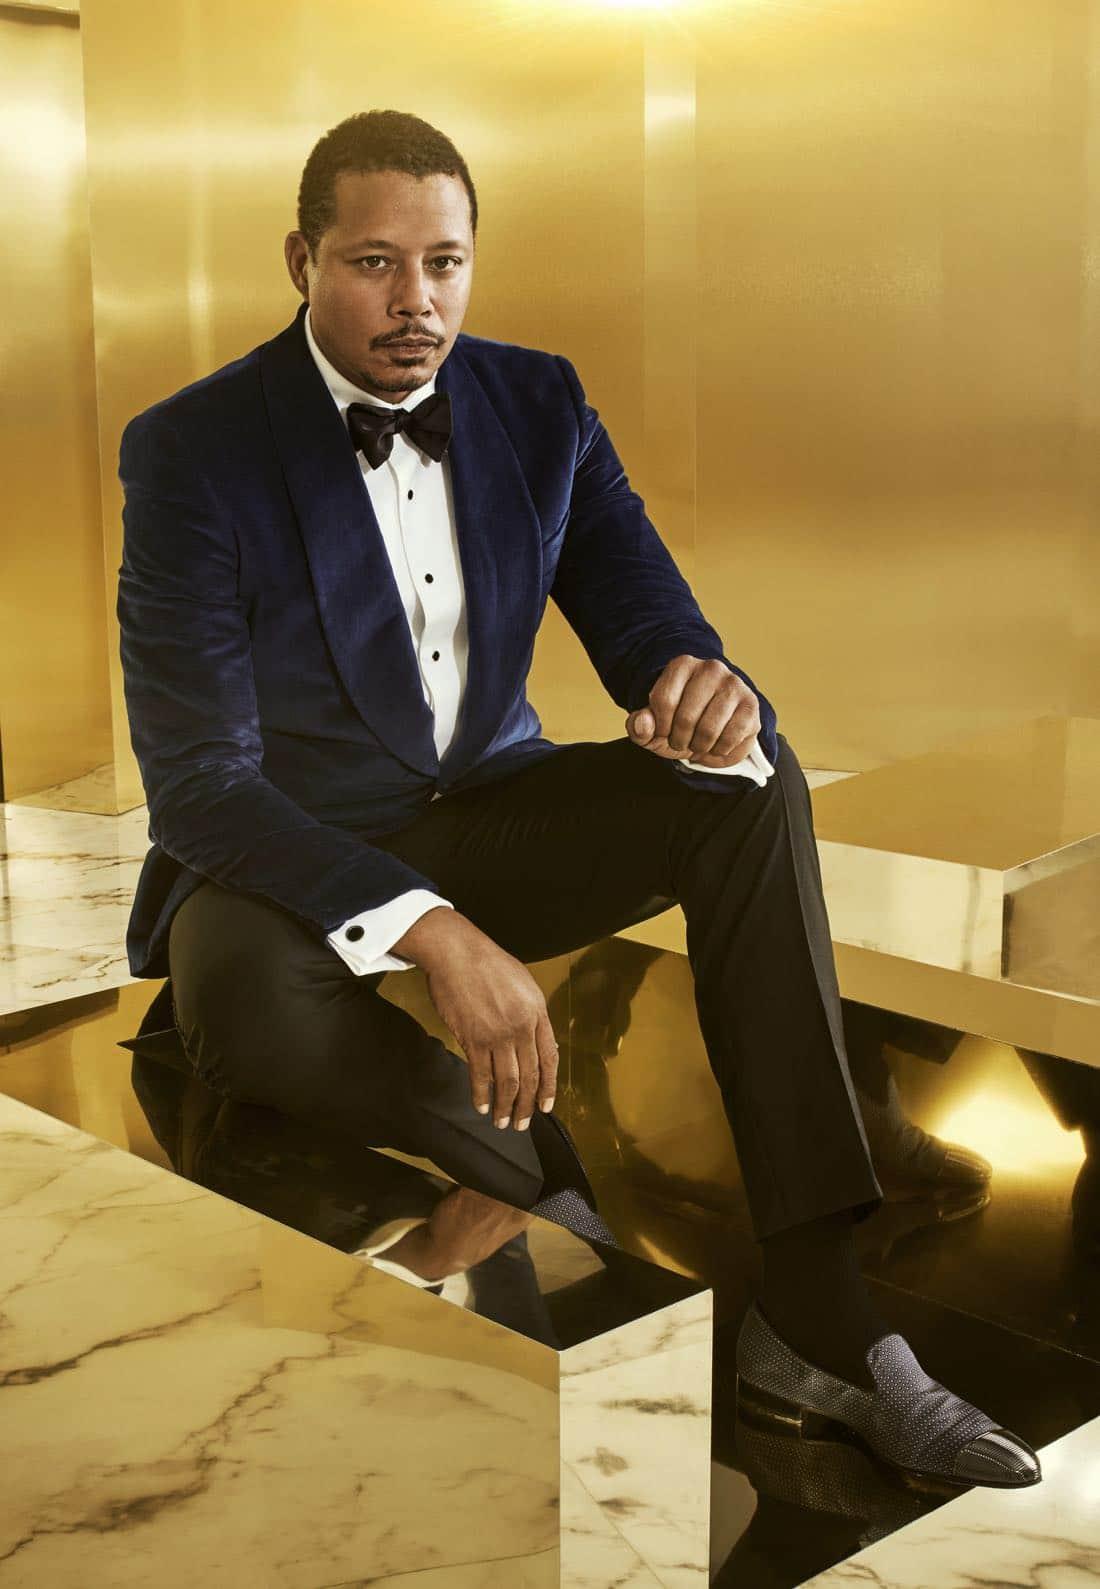 EMPIRE: Terrence Howard on Season Four of EMPIRE premiering Wednesday, Sept. 27 (8:00-9:00 PM ET/PT) on FOX. ©2017 Fox Broadcasting Co. CR: Michael Lavine/FOX